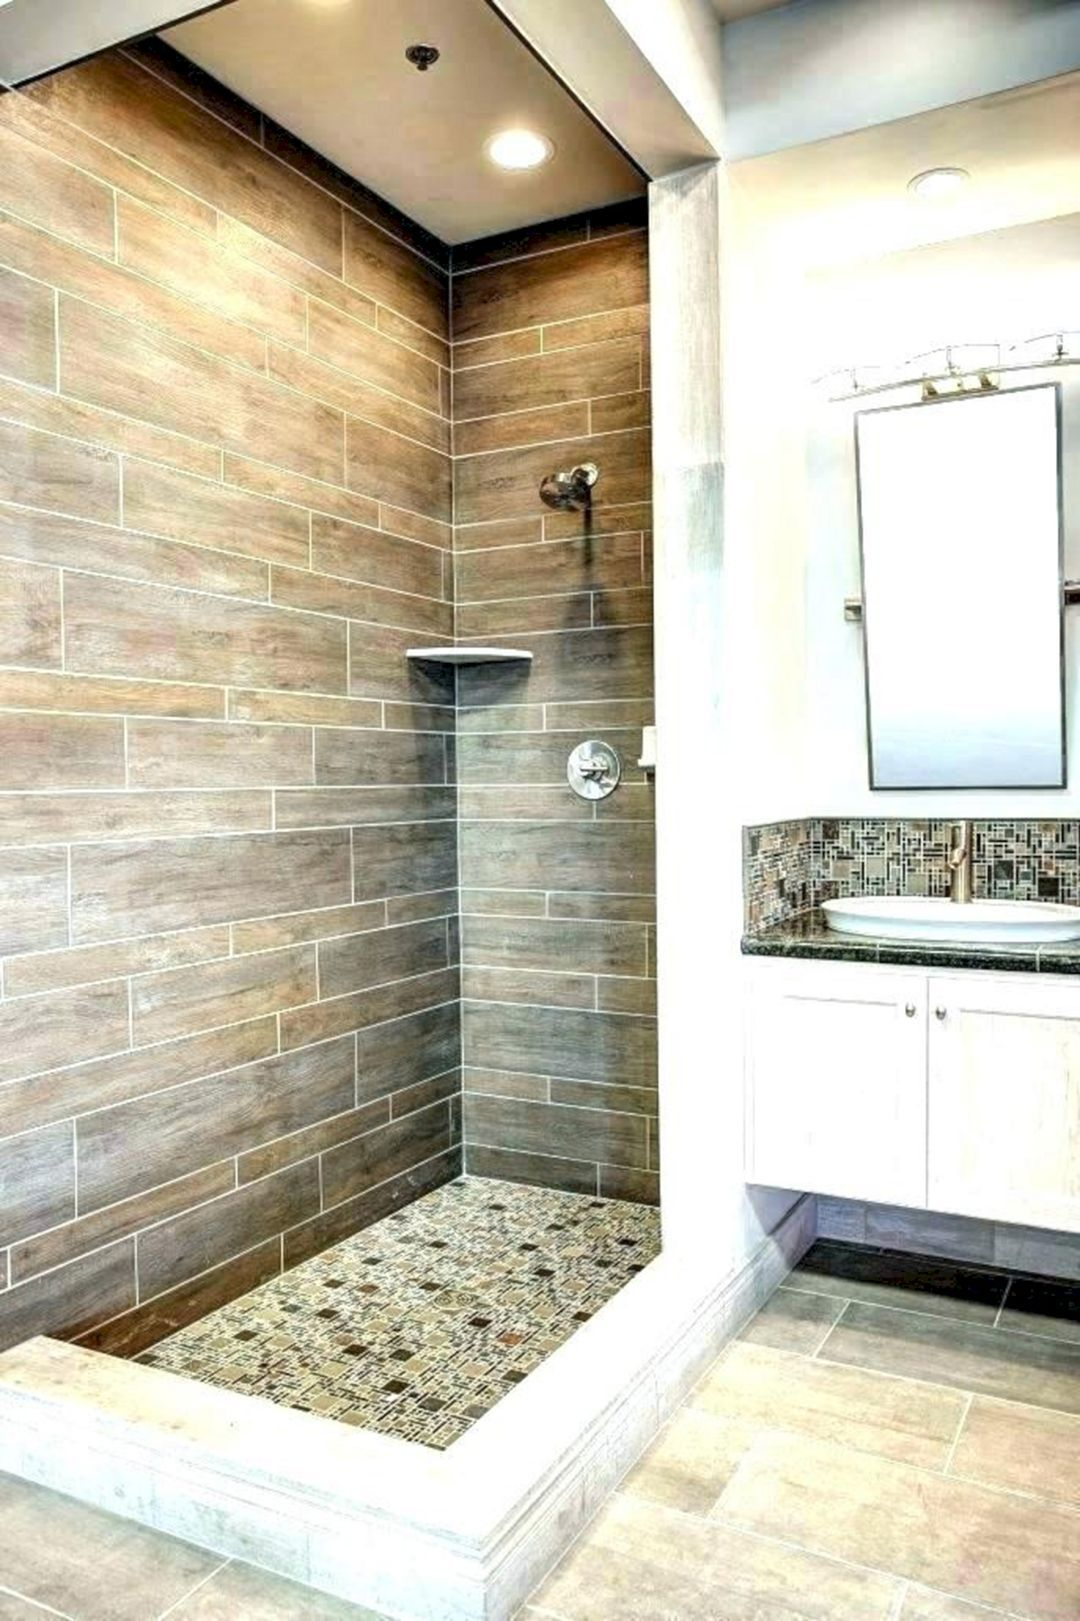 Best 20 Best And Beautiful Small Bathroom Shower Ideas Https Usdecorating Com 5443 20 Best An Bathroom Remodel Shower Tiny House Bathroom Wood Tile Bathroom